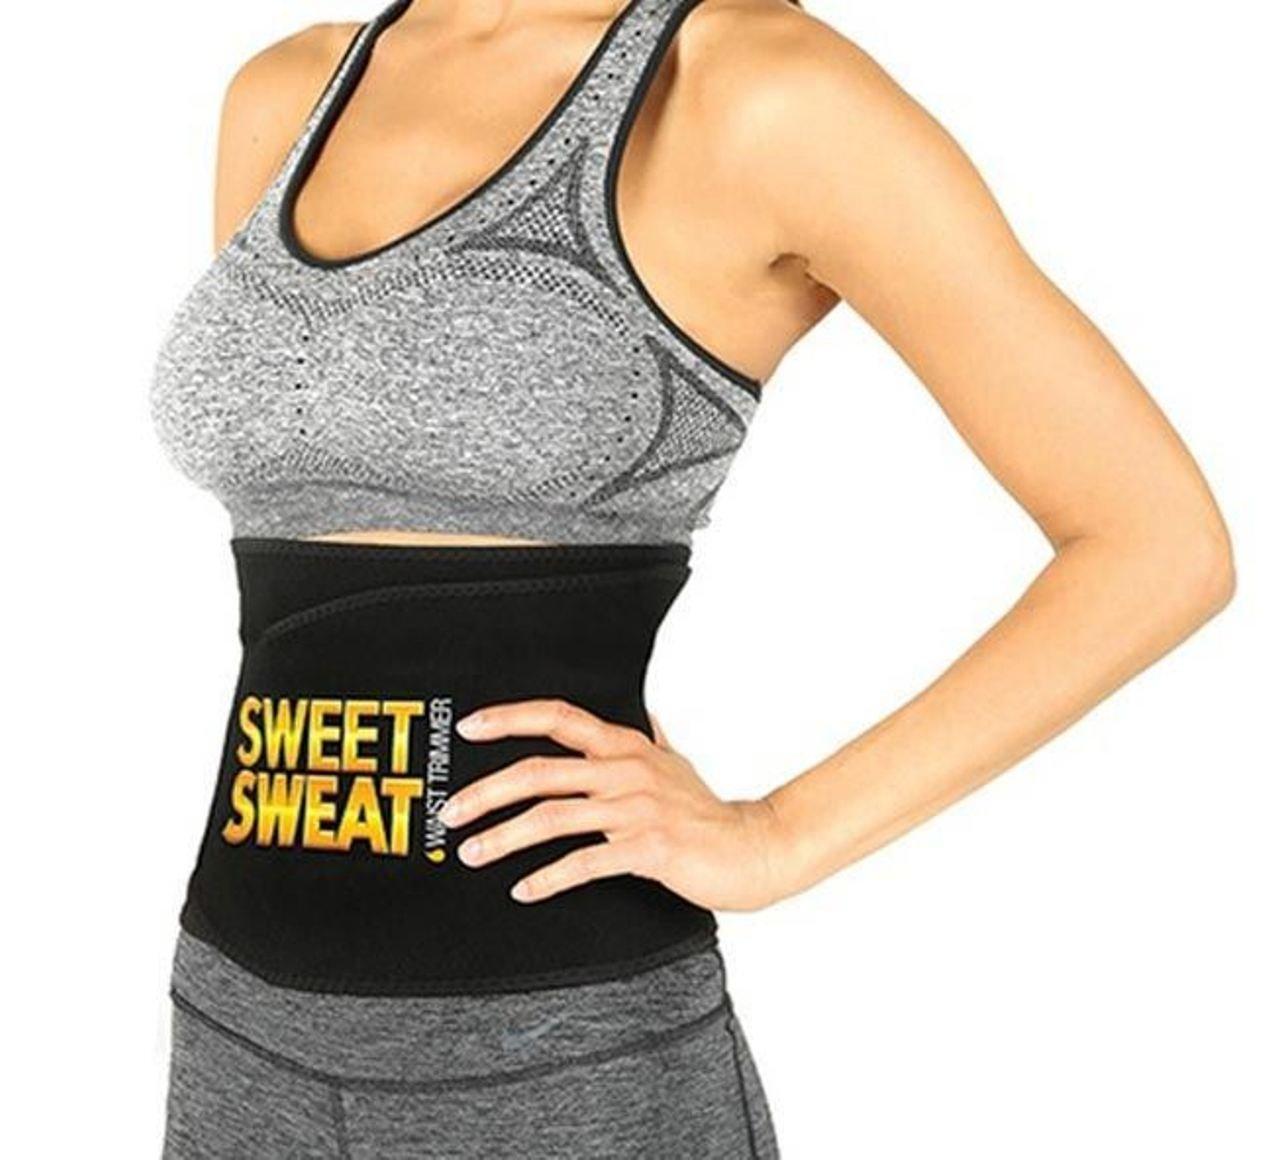 e4e9c447b89 Buy VINGABOY Sweet Sweat Slimming Belt/Tummy Trimmer Hot Body Shaper Slim  Belt/Hot Waist Shaper Belt Instant Slim Look Belt for Women Online at Low  Prices ...